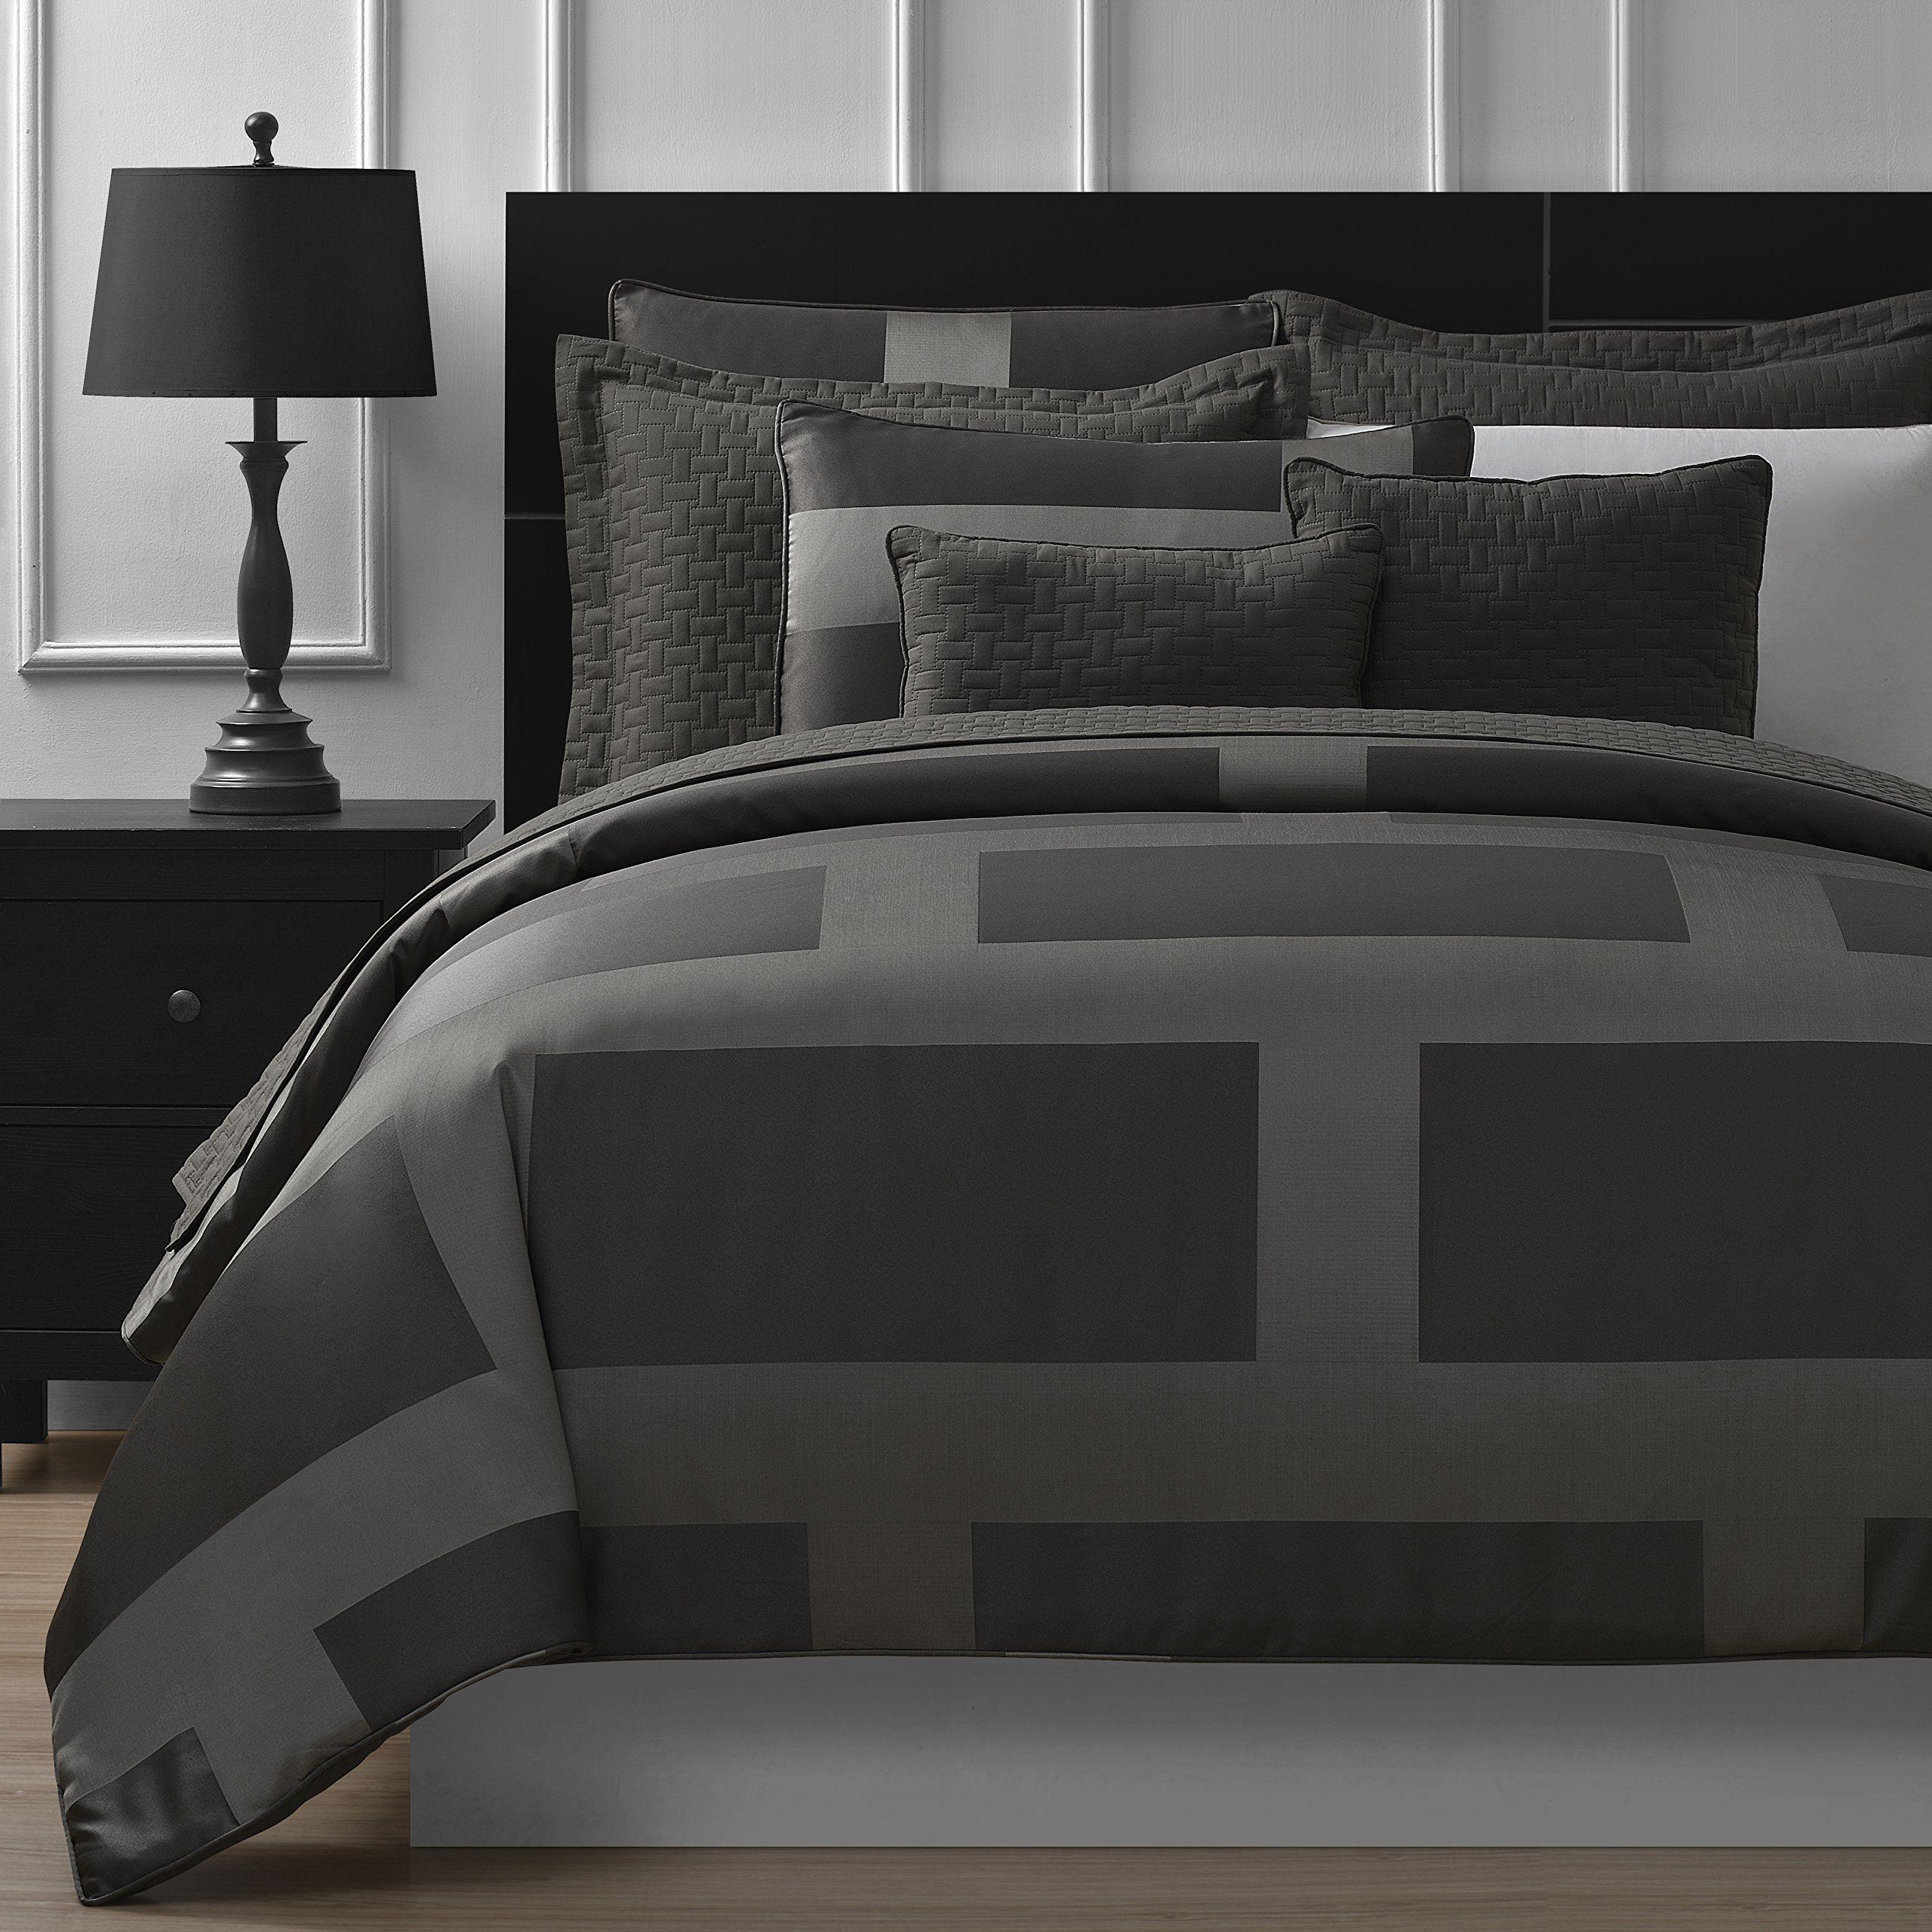 P&R Bedding Frame Jacquard Microfiber 5Piece Comforter